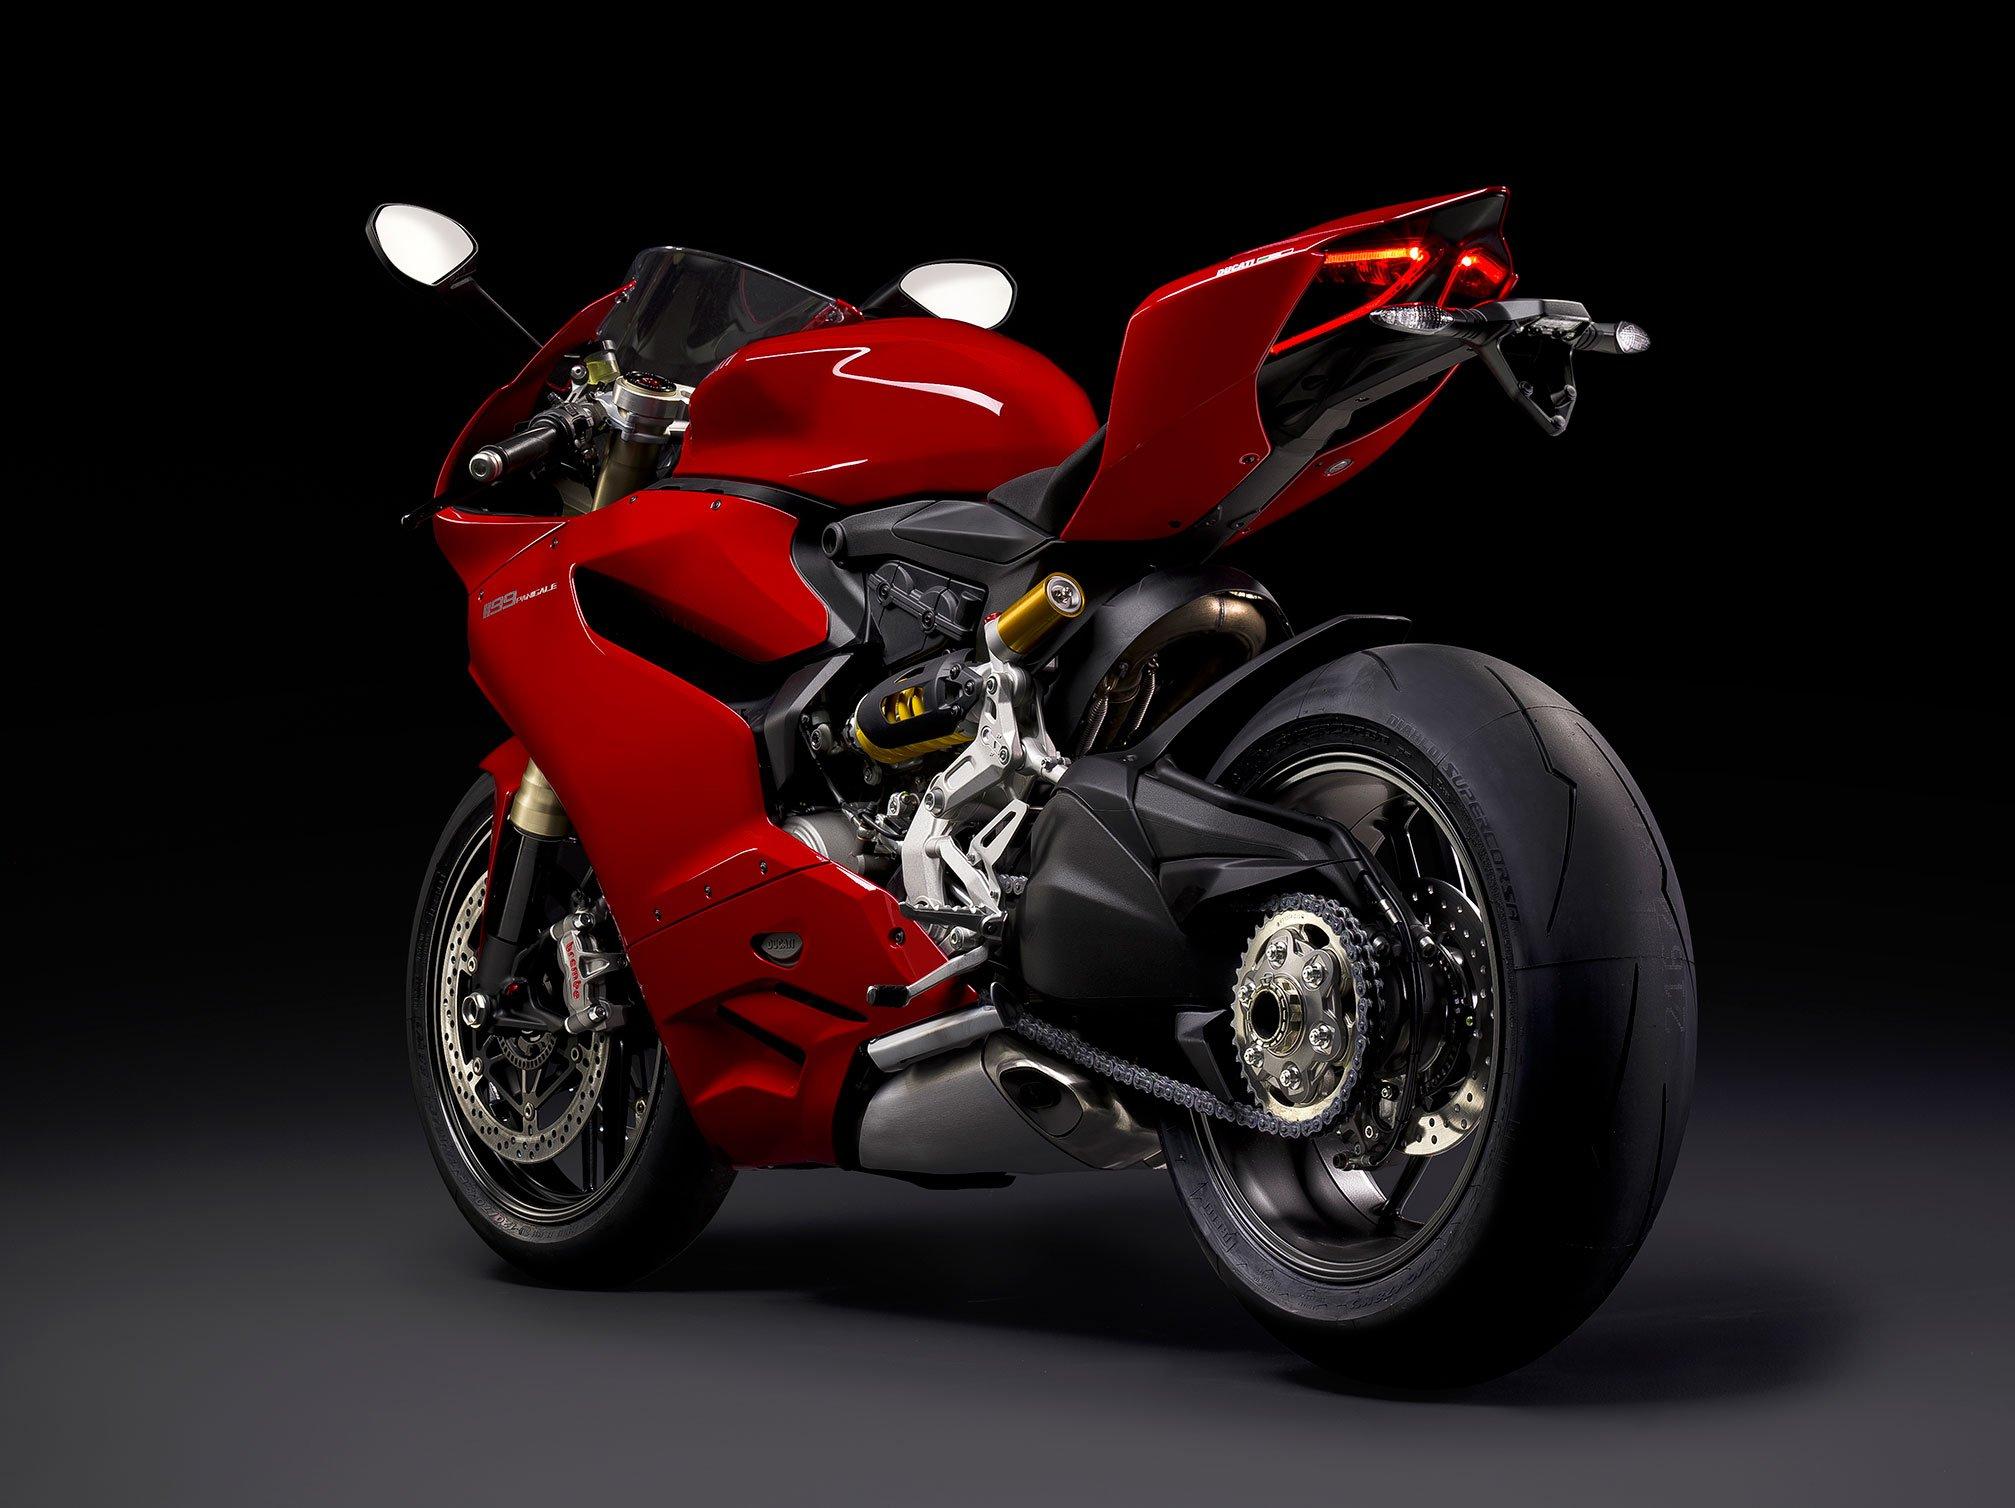 Ducati 1198 Panigale 1199 Panigale 2014 Ducati